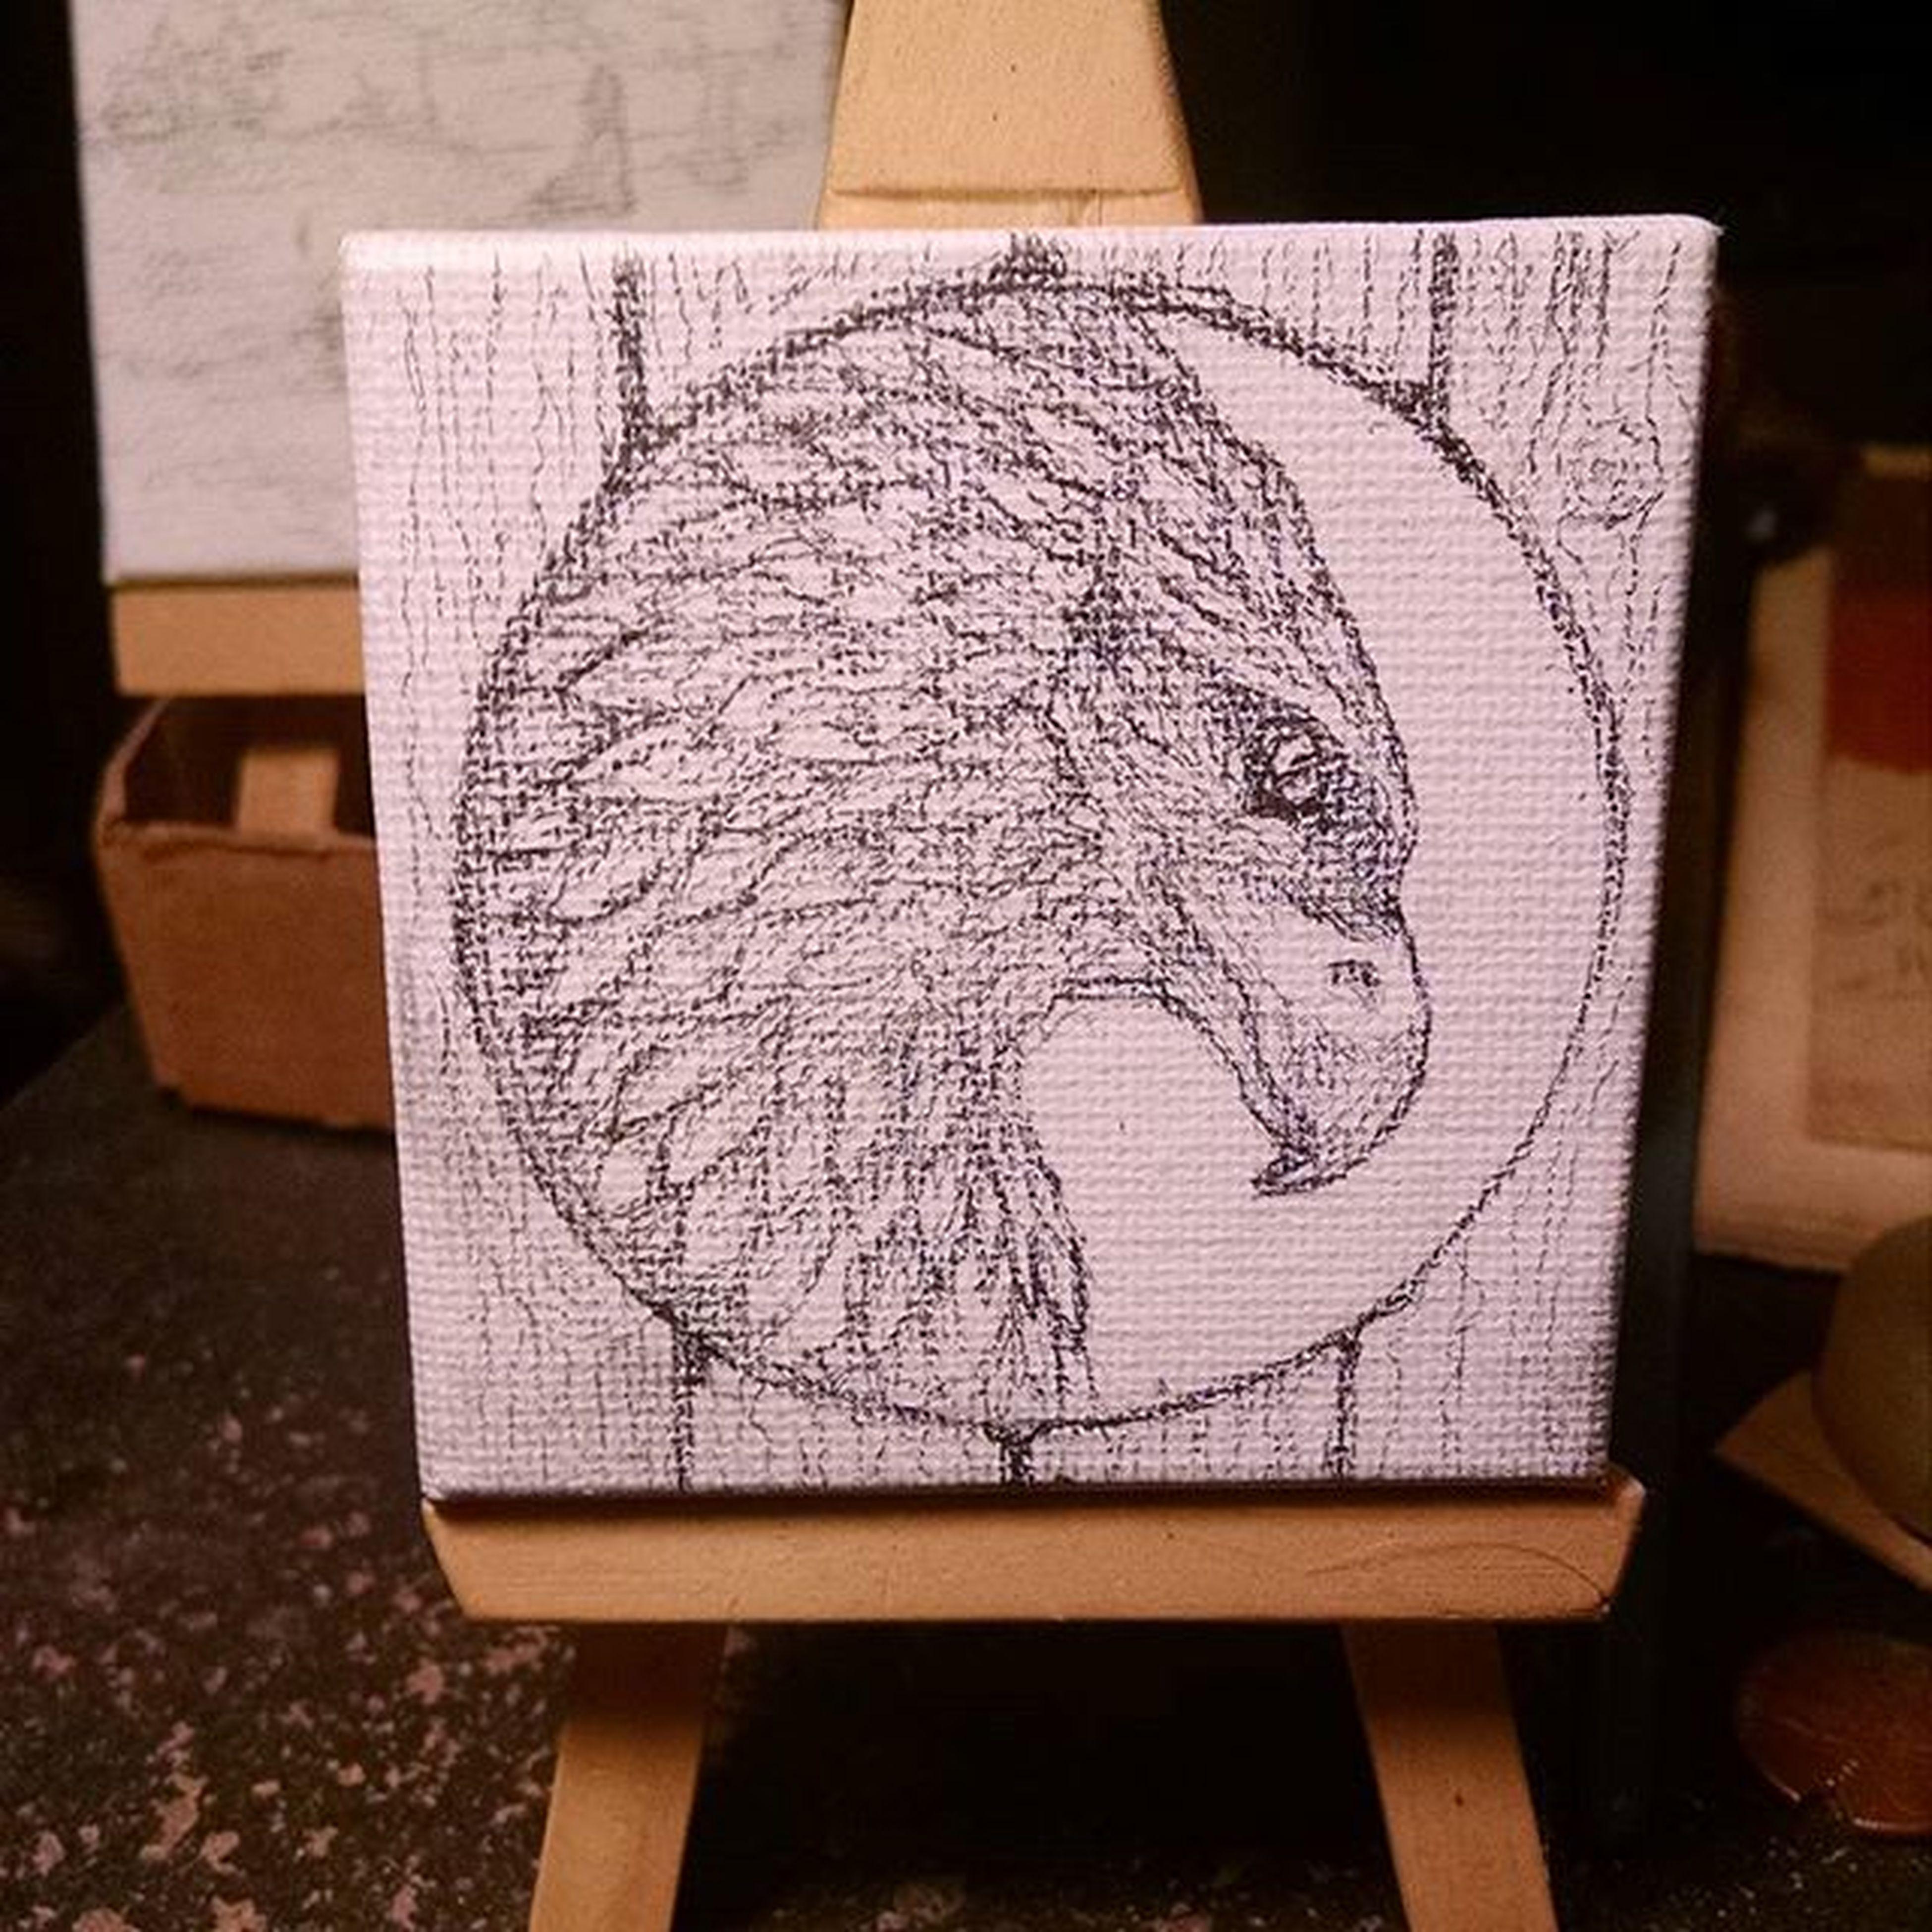 Pencil sketch on mini canvas. Eagle medicine :) Art Artist Pencil Sketch Eagle Totem Medicinecards